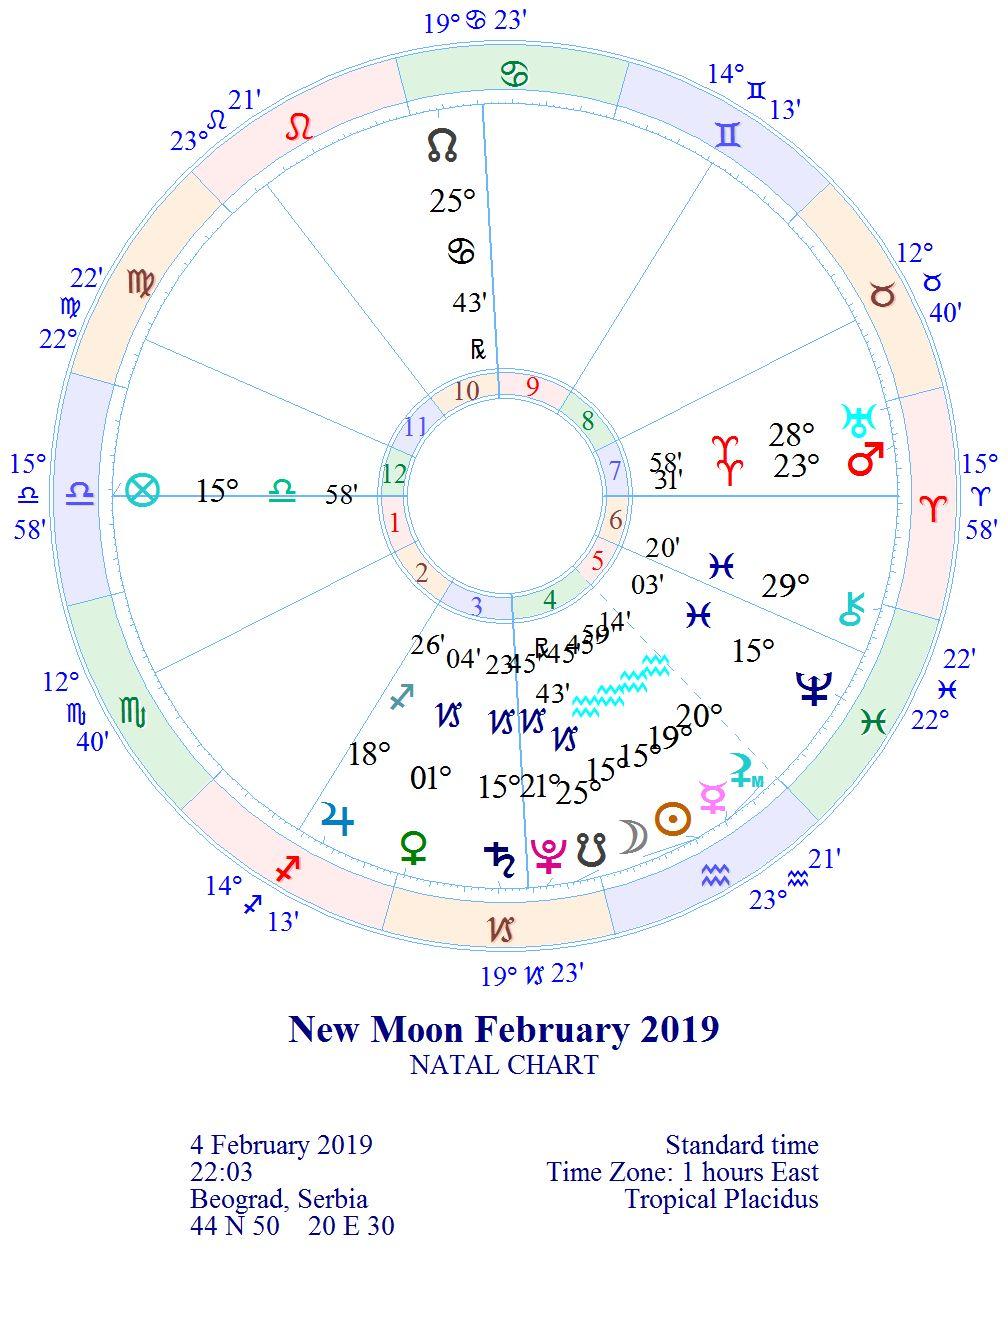 "NOVI LUNARNI CIKLUS 1. lunarni dan ""Svetiljka"" 06.03. u 17:03 *MLAD MESEC 15° RIBA"